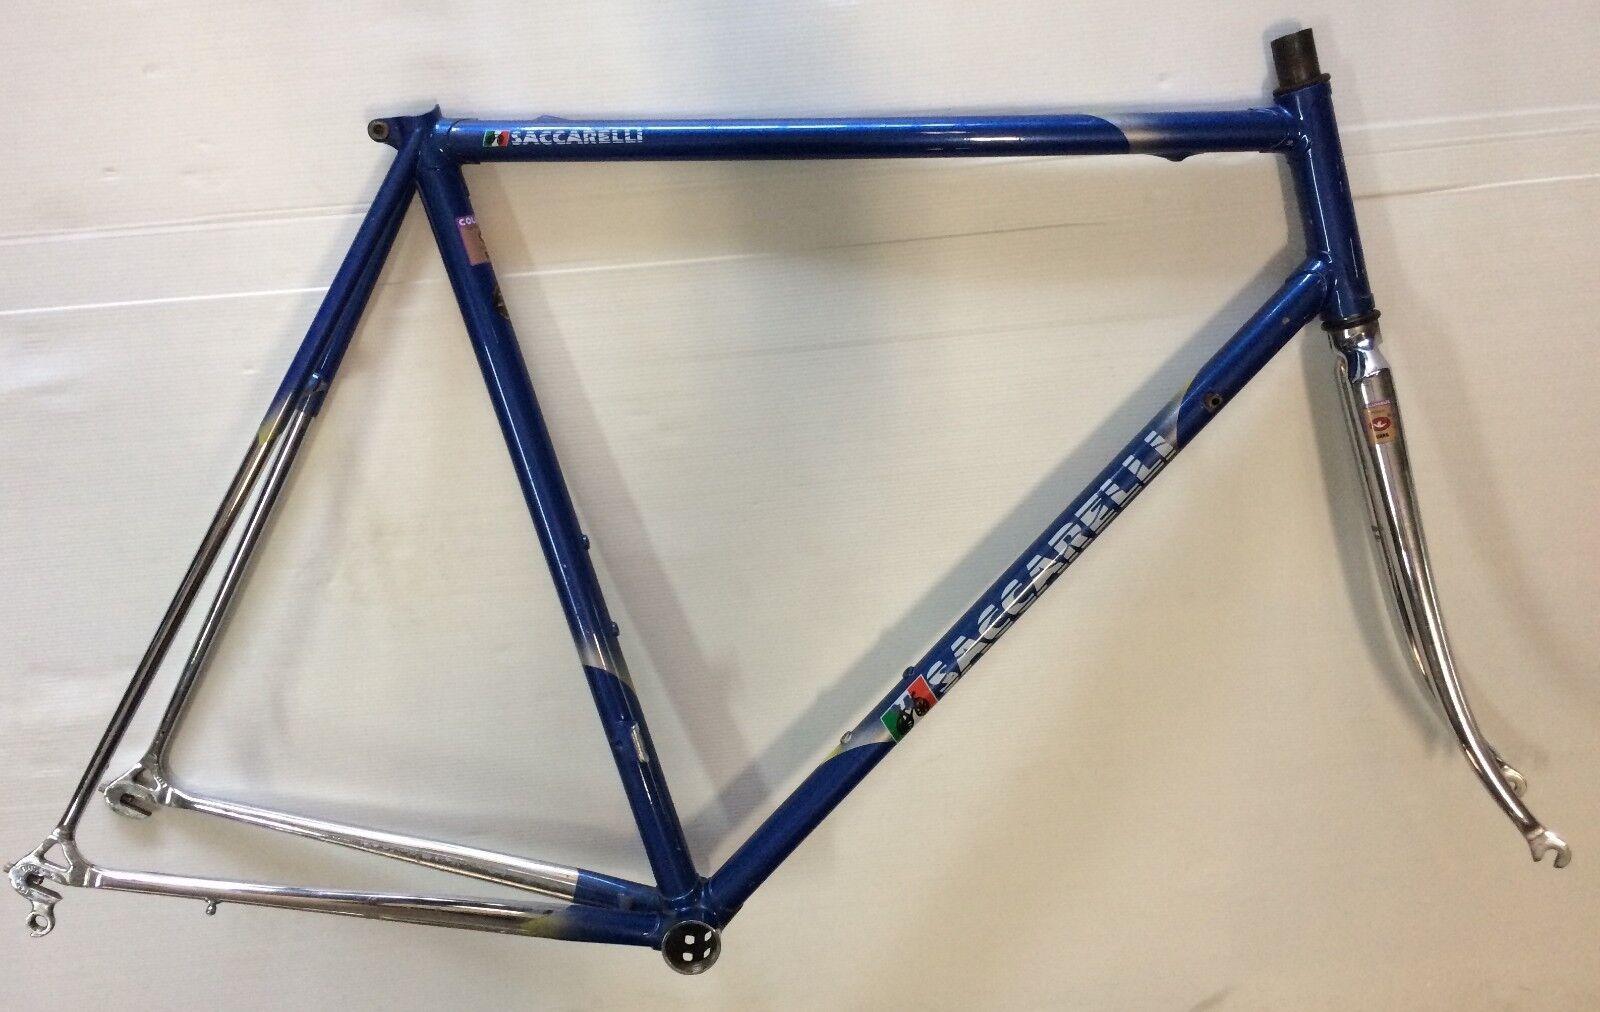 Rahmen Fahrrad Stahl Saccarelli Road Steel Frame Columbus 56 Gemacht in Italien